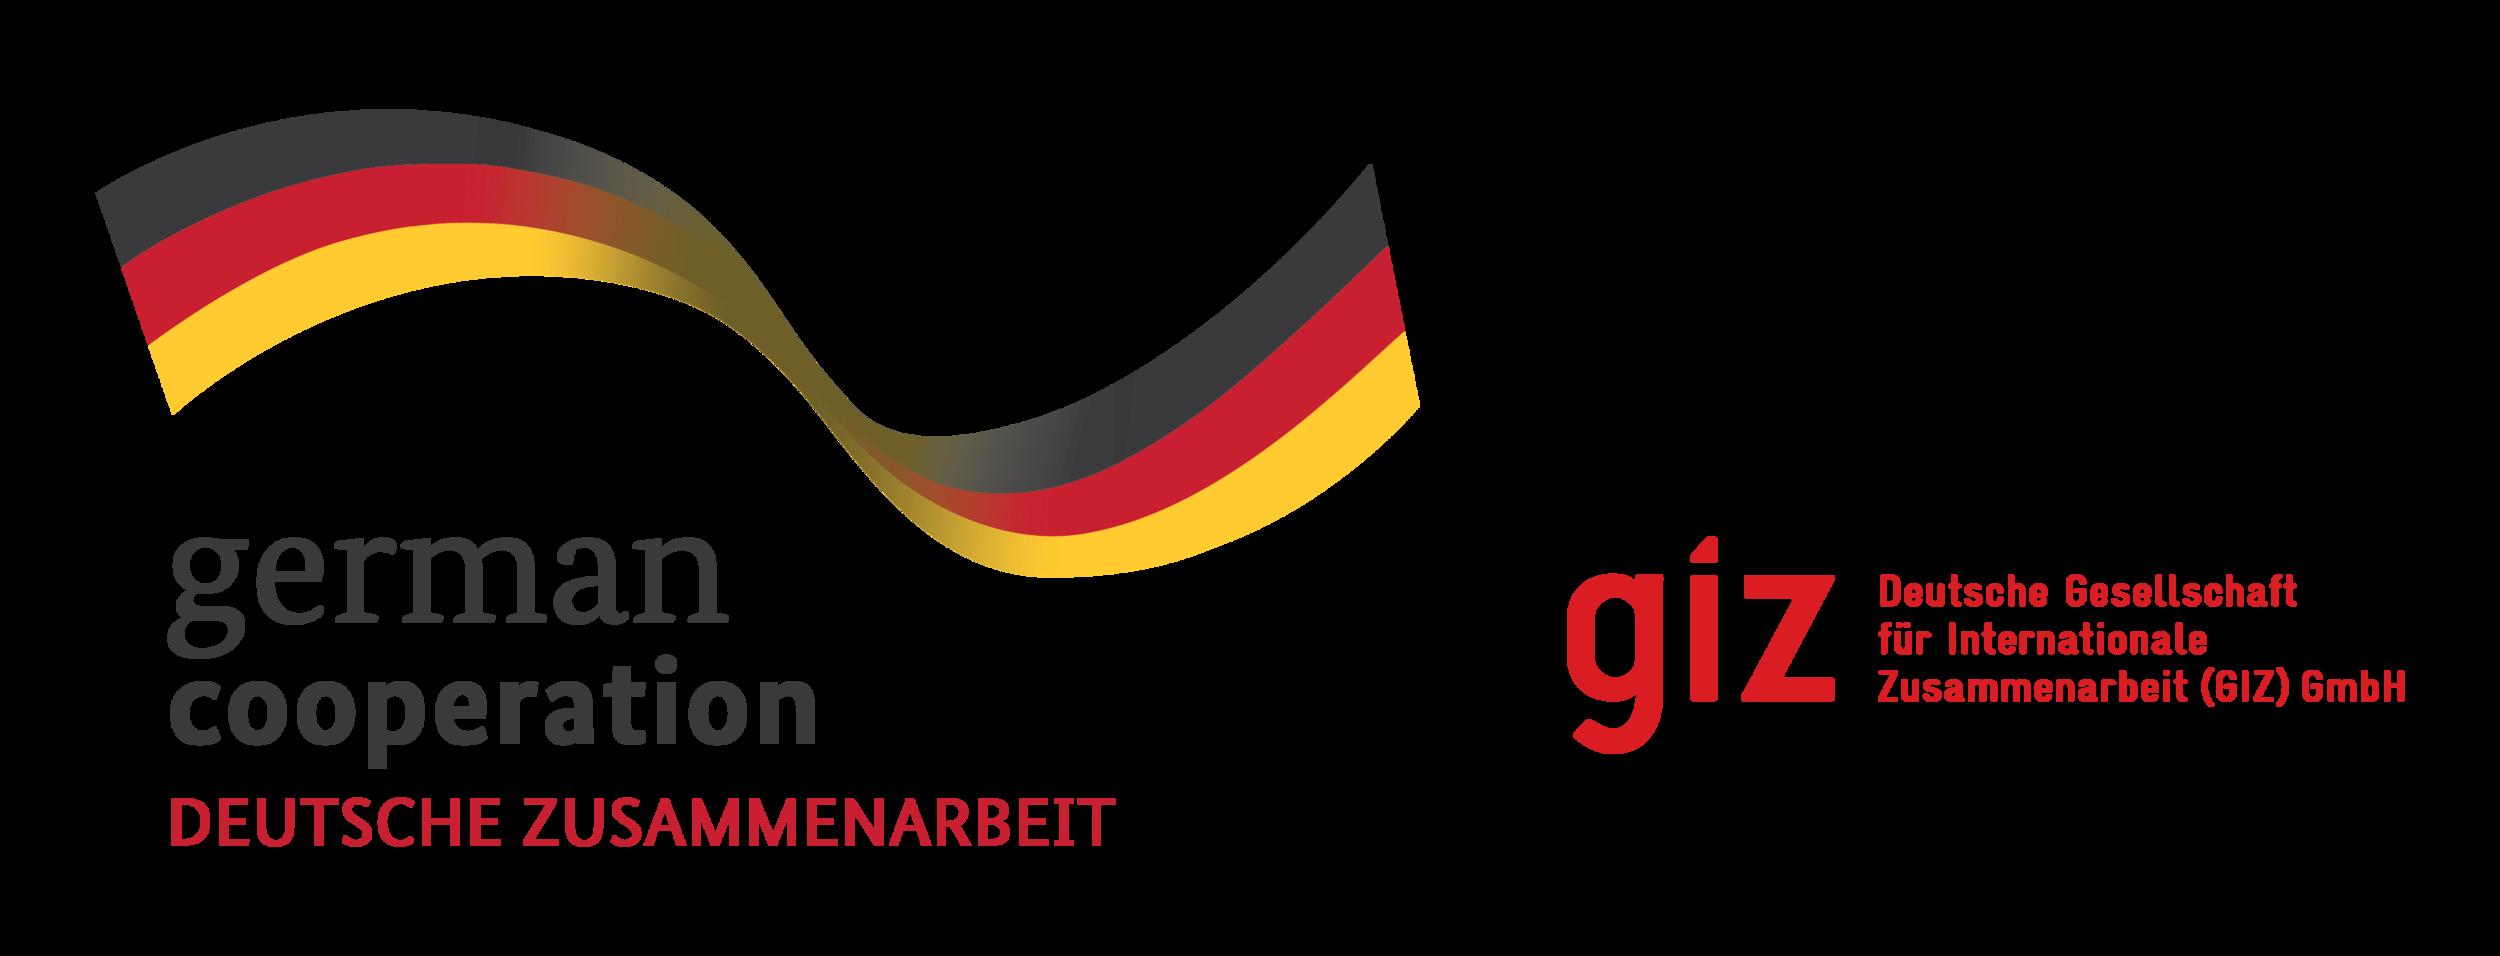 GIZ German Coop Logo.png